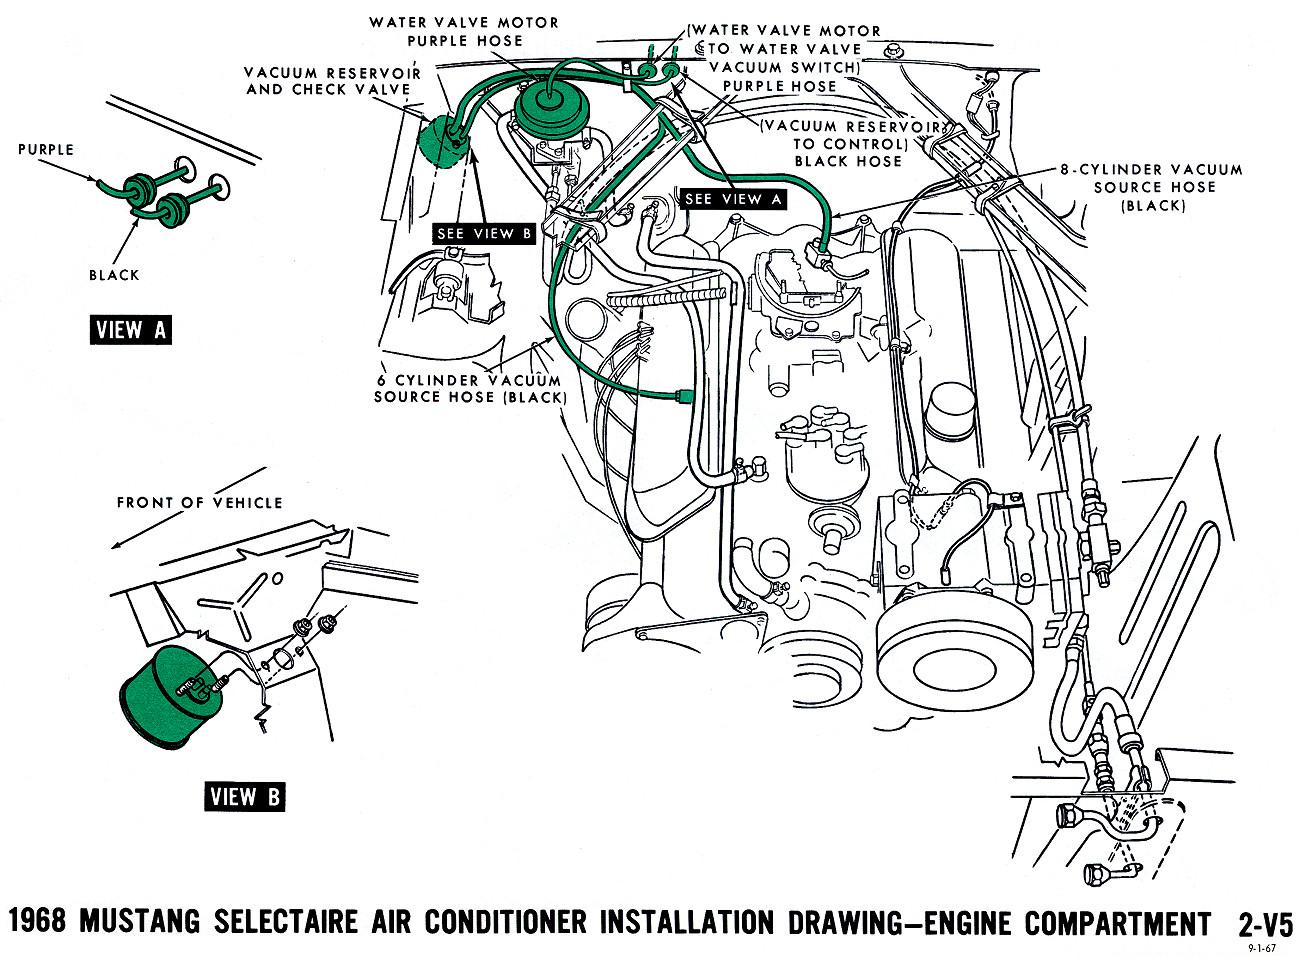 mustang vacuum diagrams and schematics vacuum diagrams table of 4.6 Cobra Engine